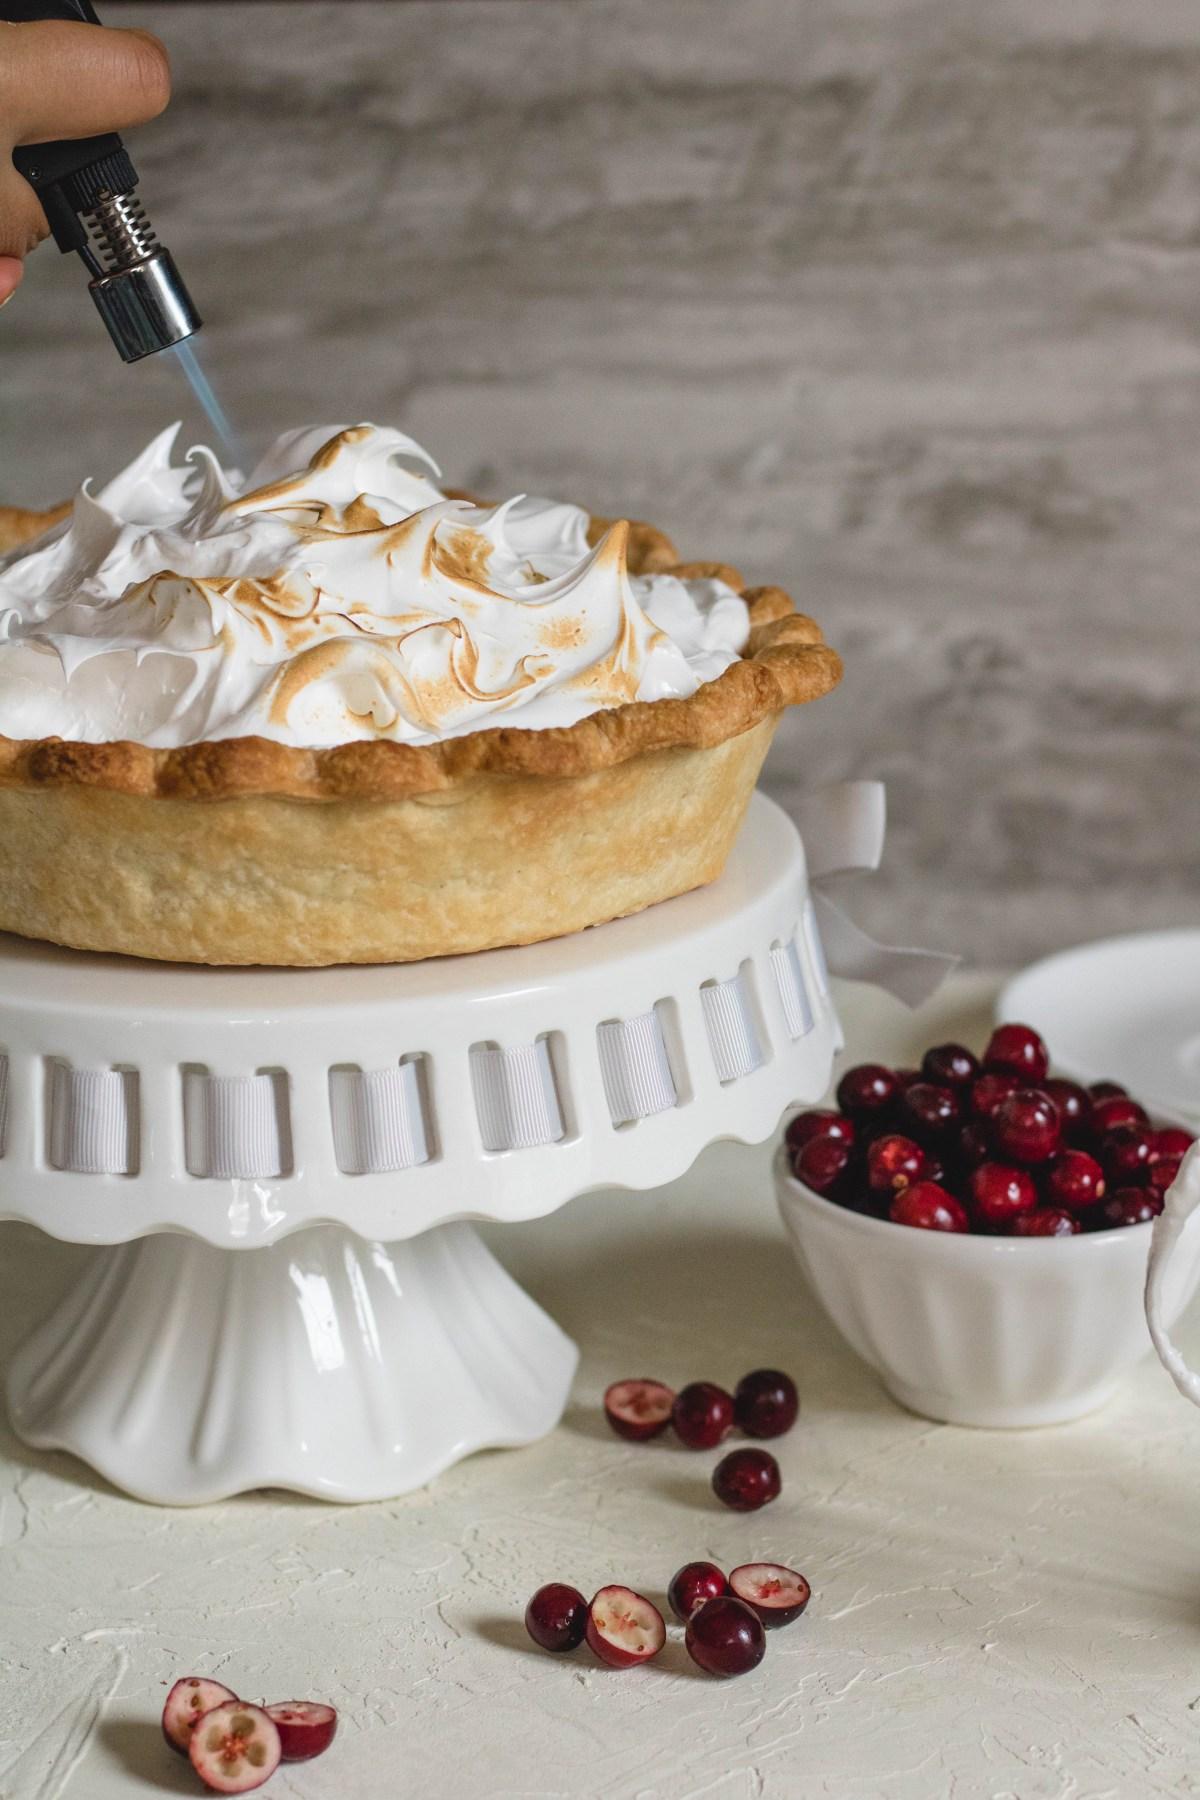 Cranberry meringue pie recipe using the homemade pie crust